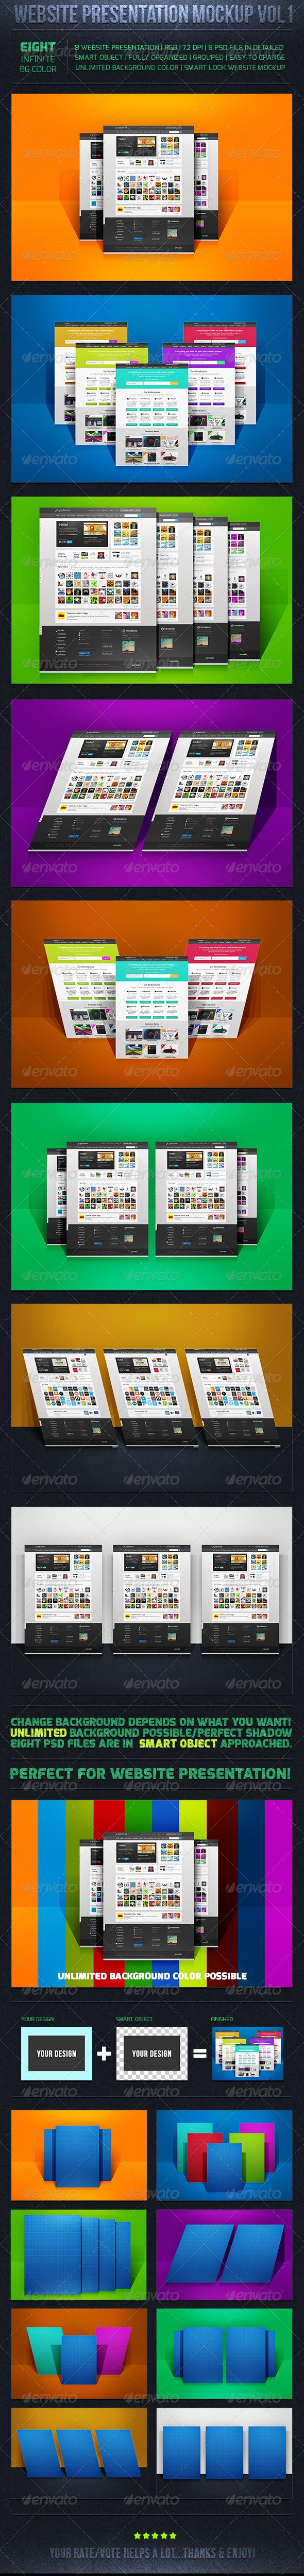 GraphicRiver Web Presentation Mockup Vol-1 6378692